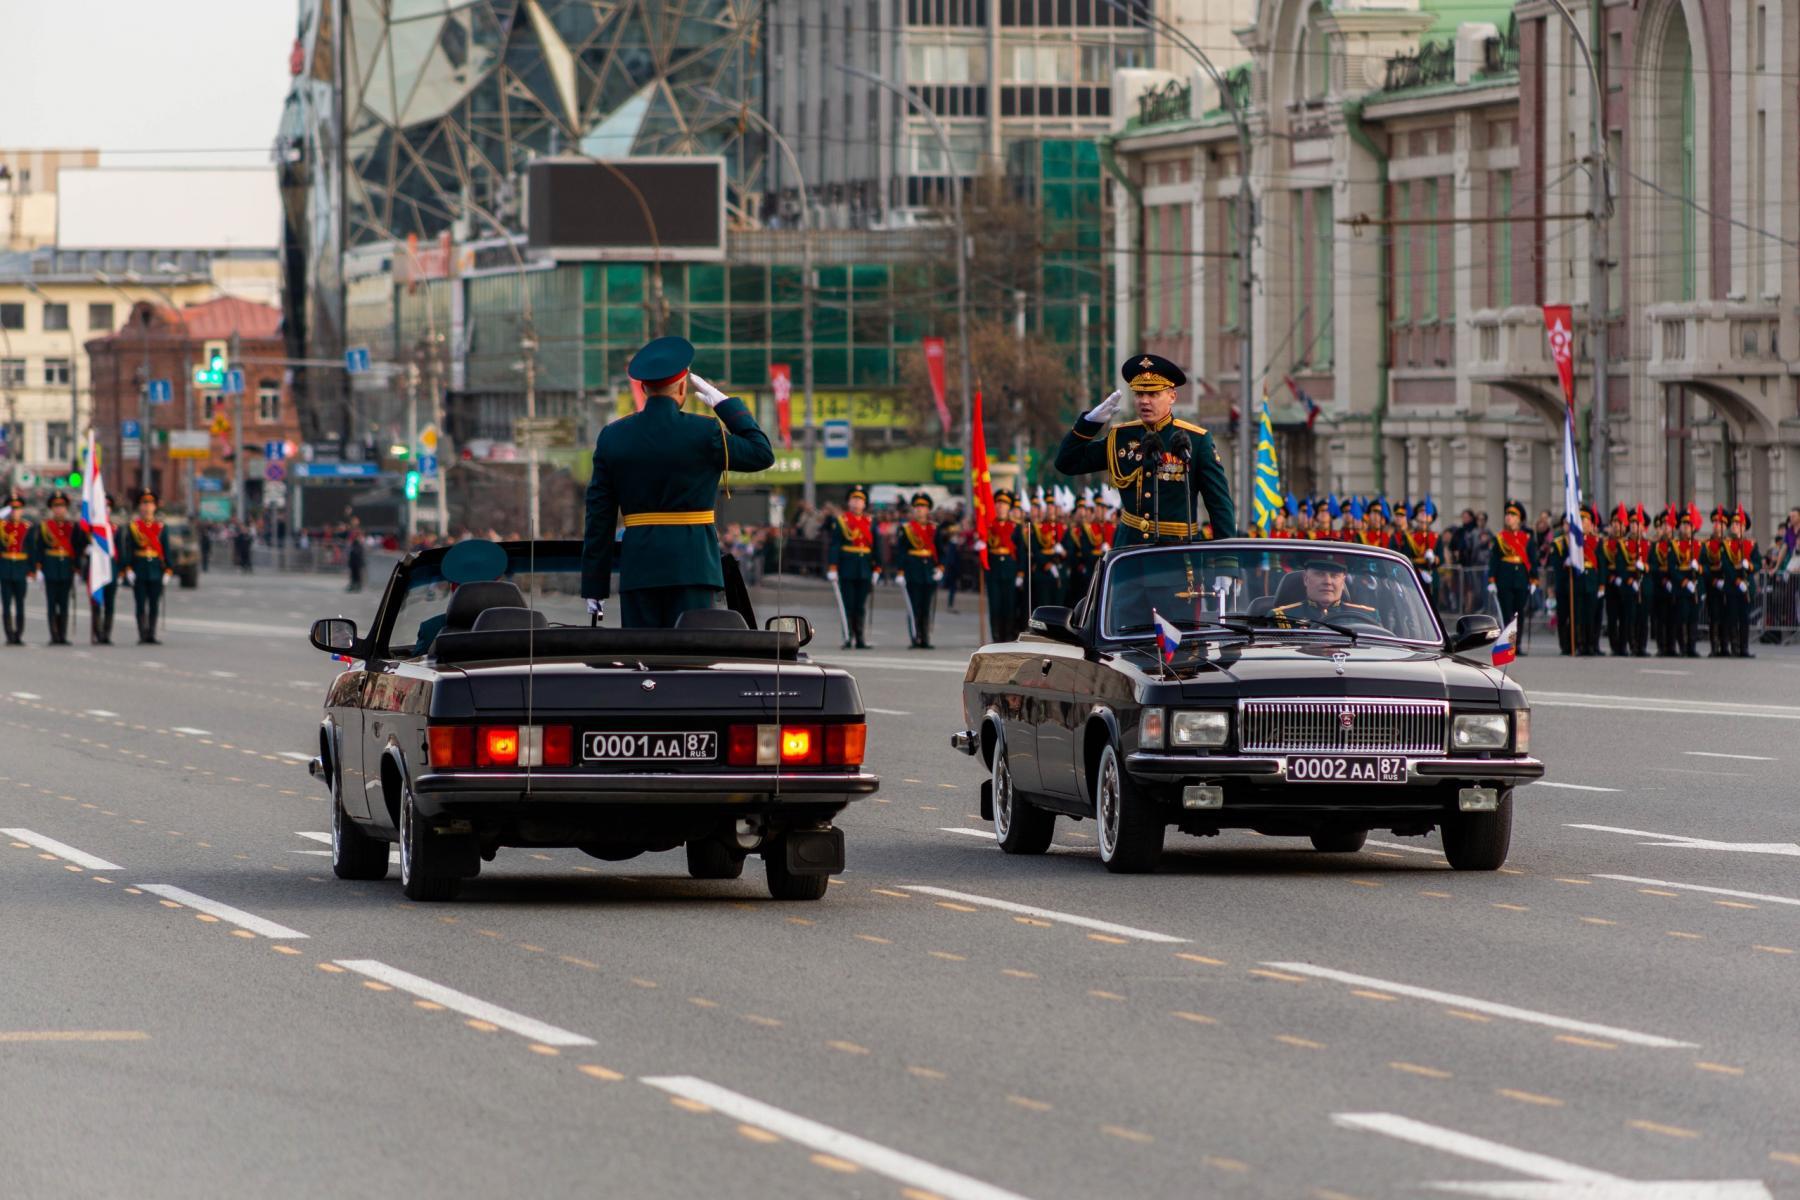 Фото Флаги, форма, техника, толпы зрителей: лучшие фото с репетиции парада в Новосибирске 9